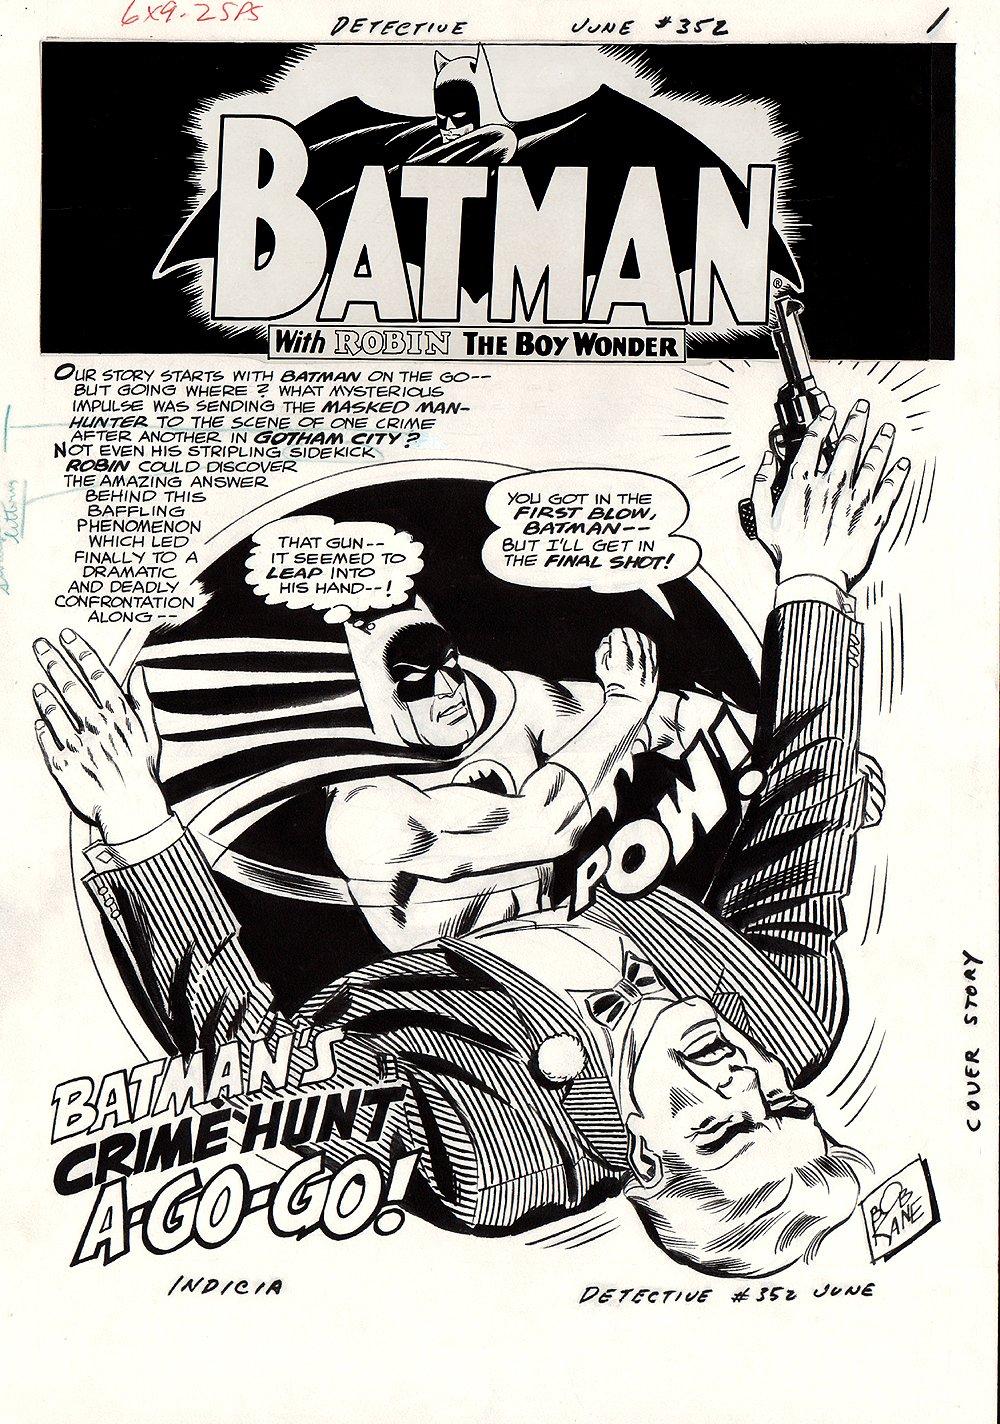 Detective Comics #352 p 1 SPLASH (Large Art) 1966